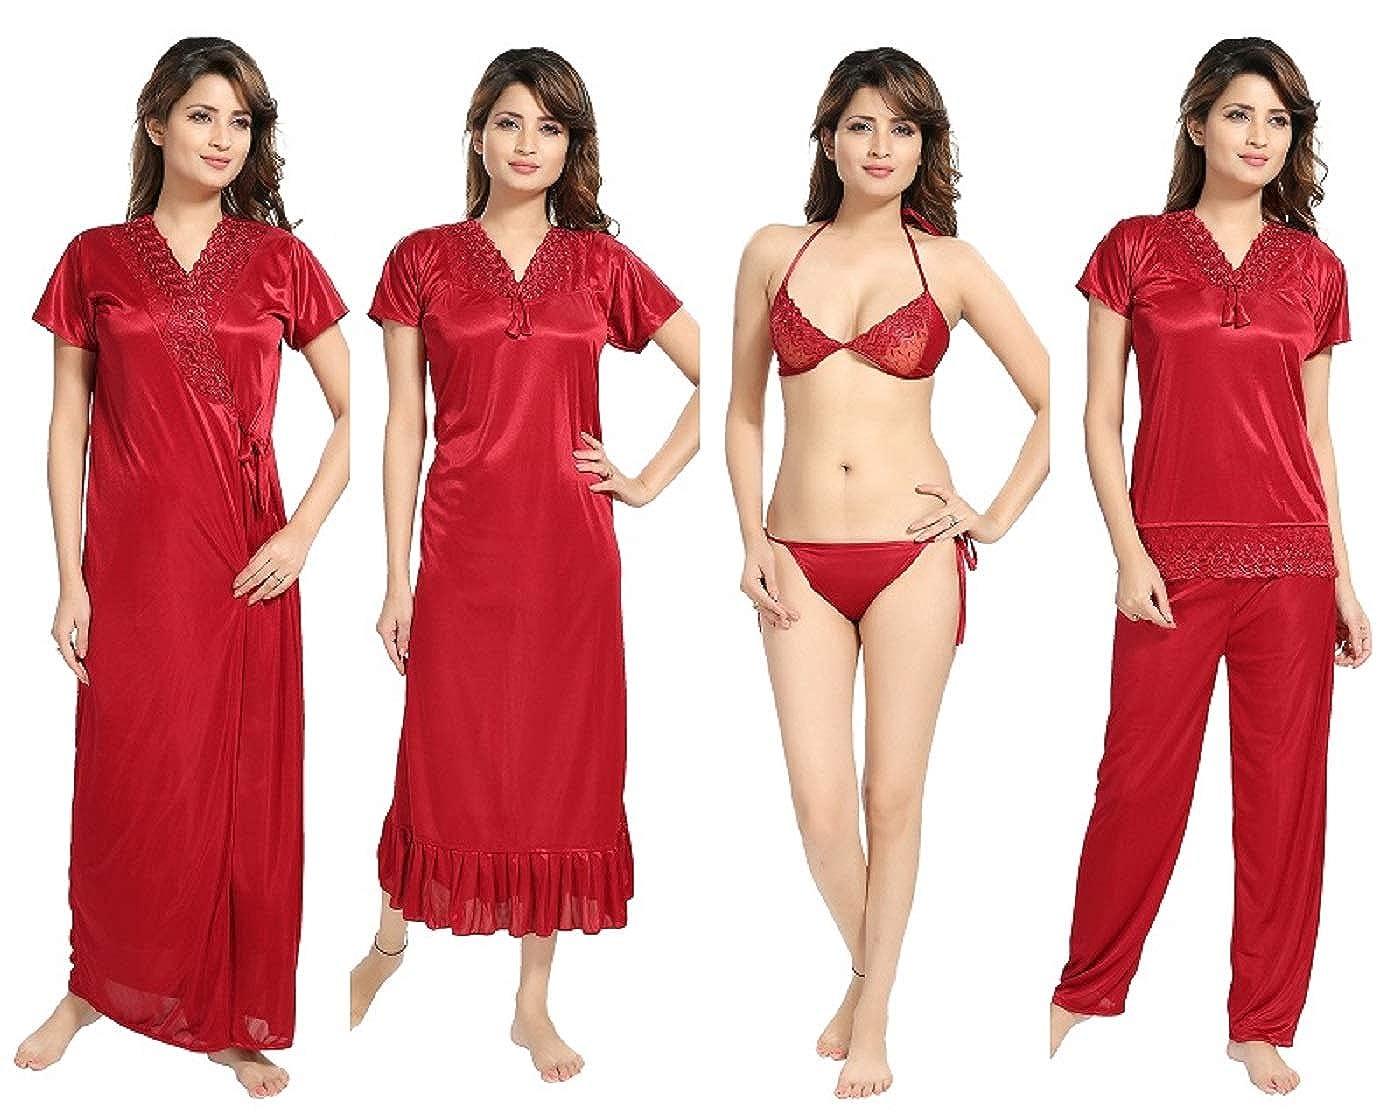 20283745f REPOSEY Women s Satin Nightwear Set of 6 Pcs Robe with Nighty